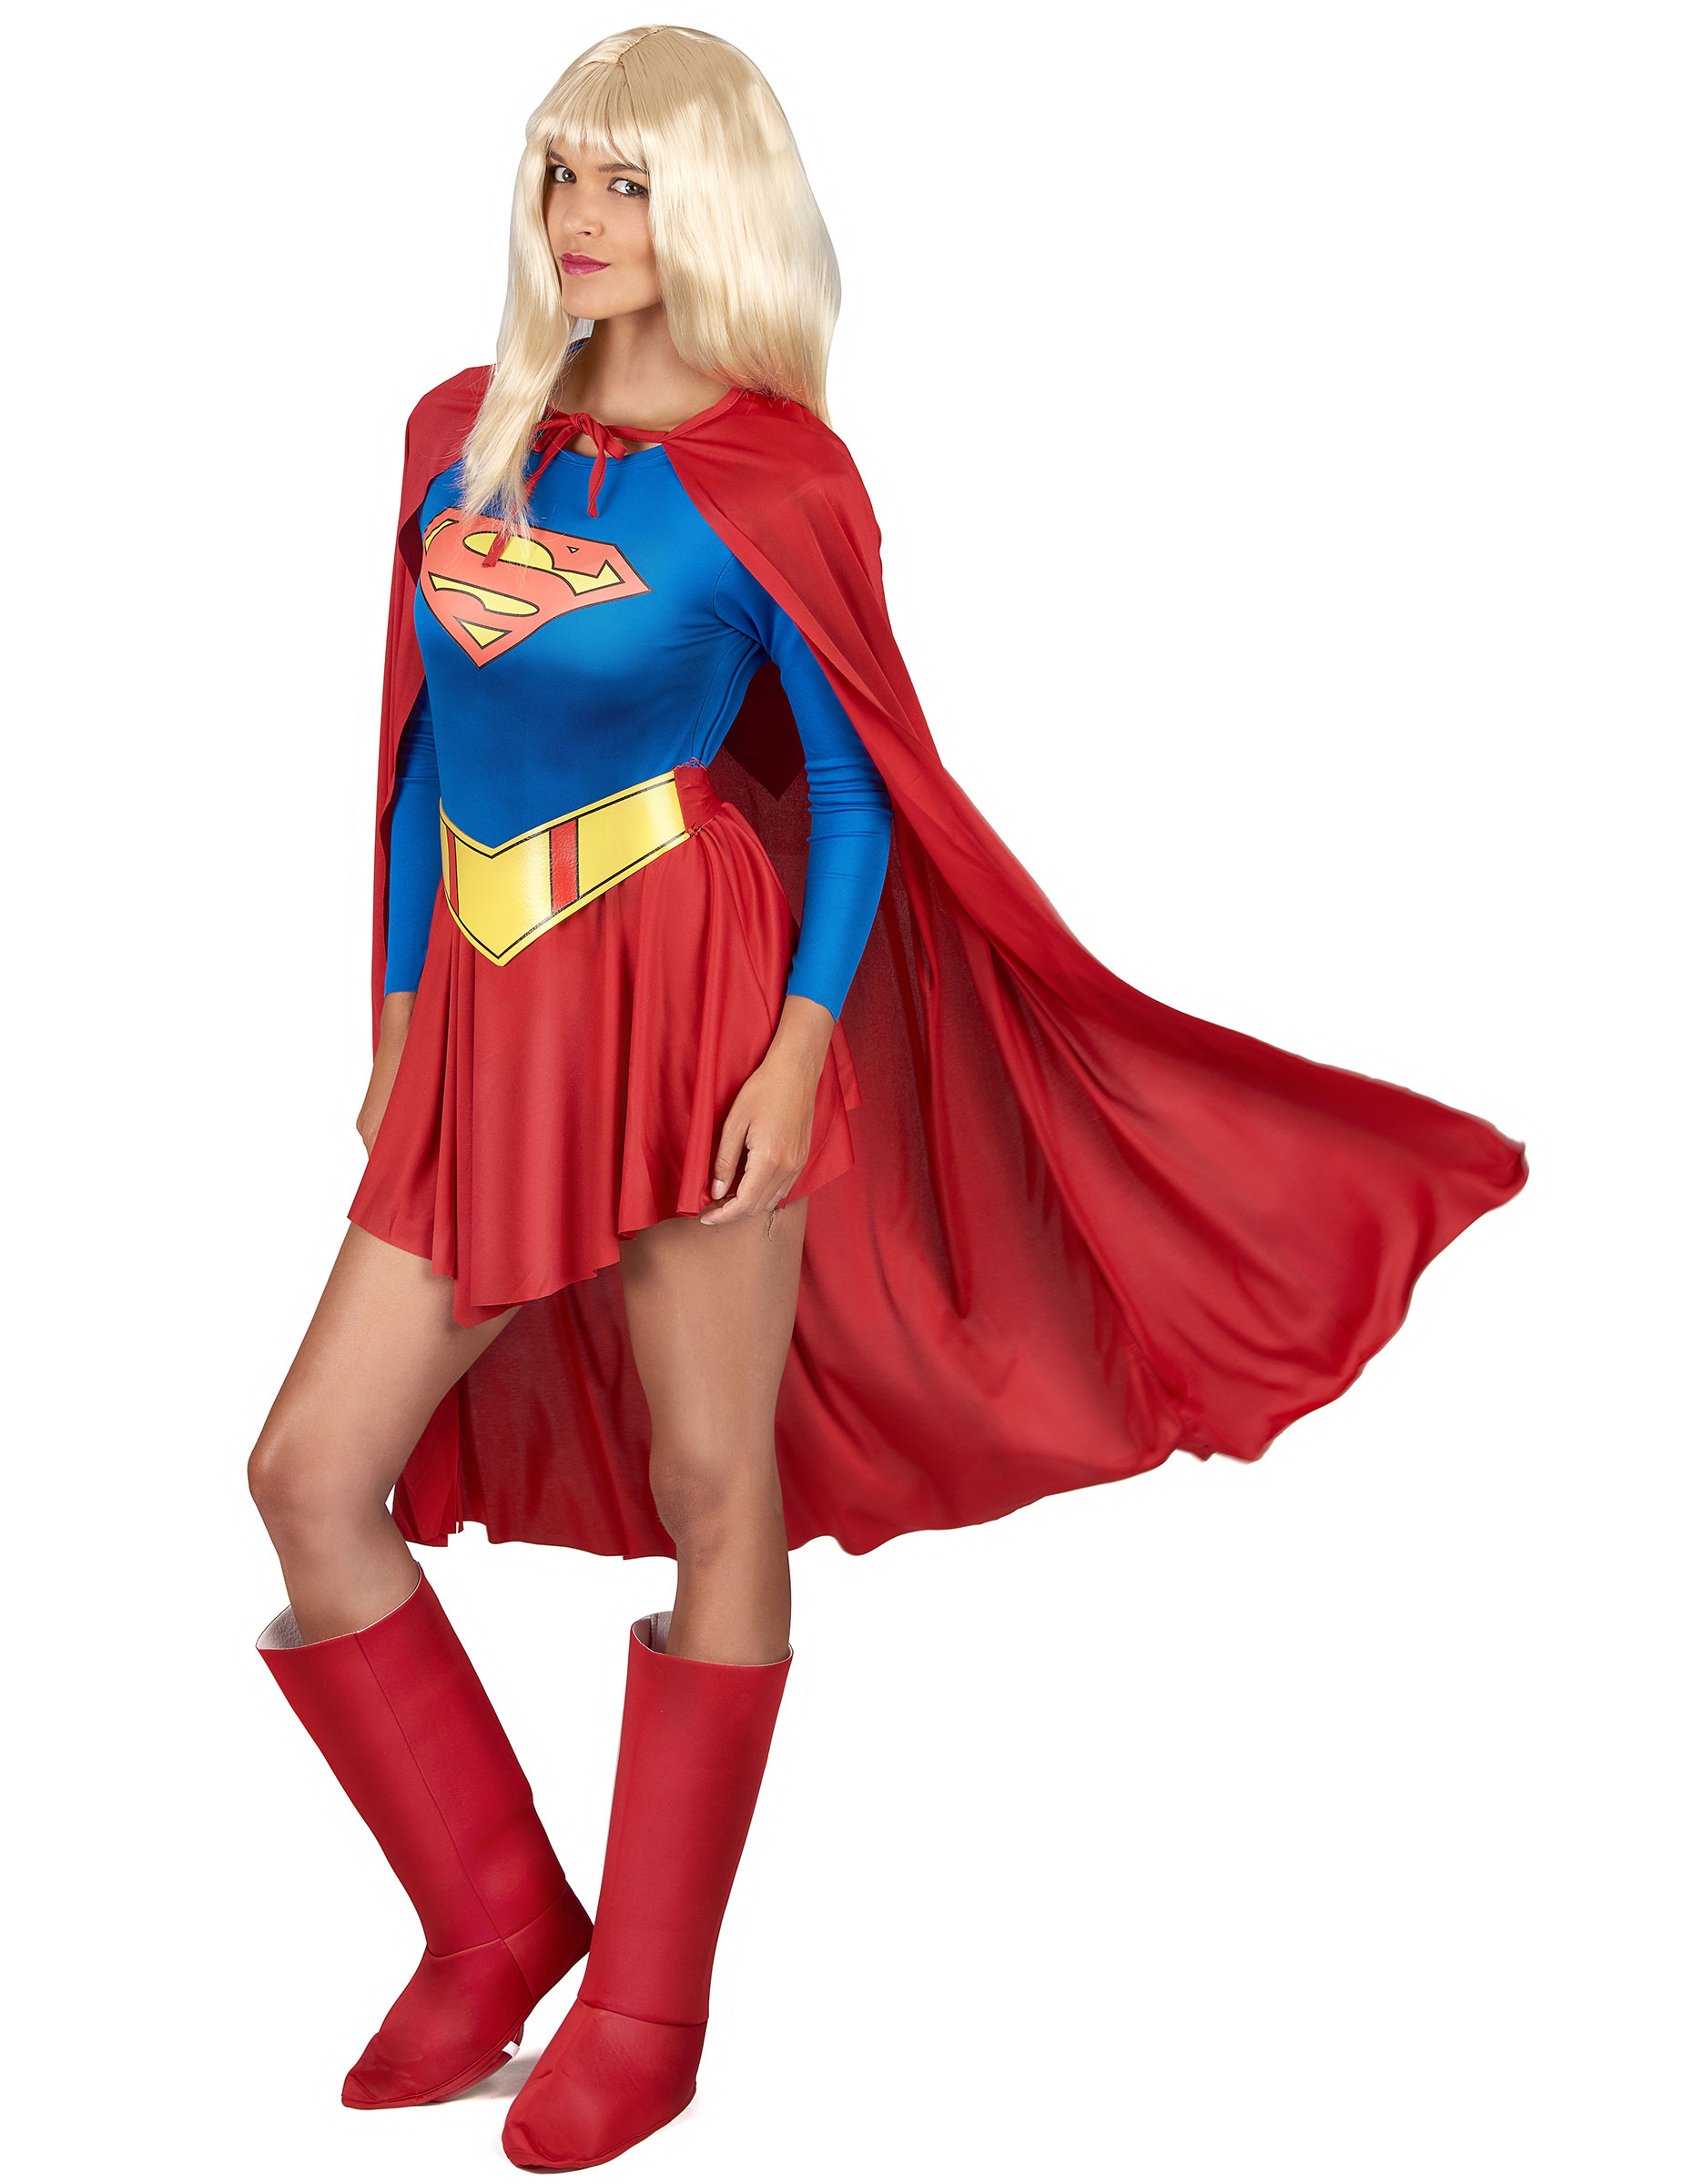 d guisement supergirl femme deguise toi achat de. Black Bedroom Furniture Sets. Home Design Ideas